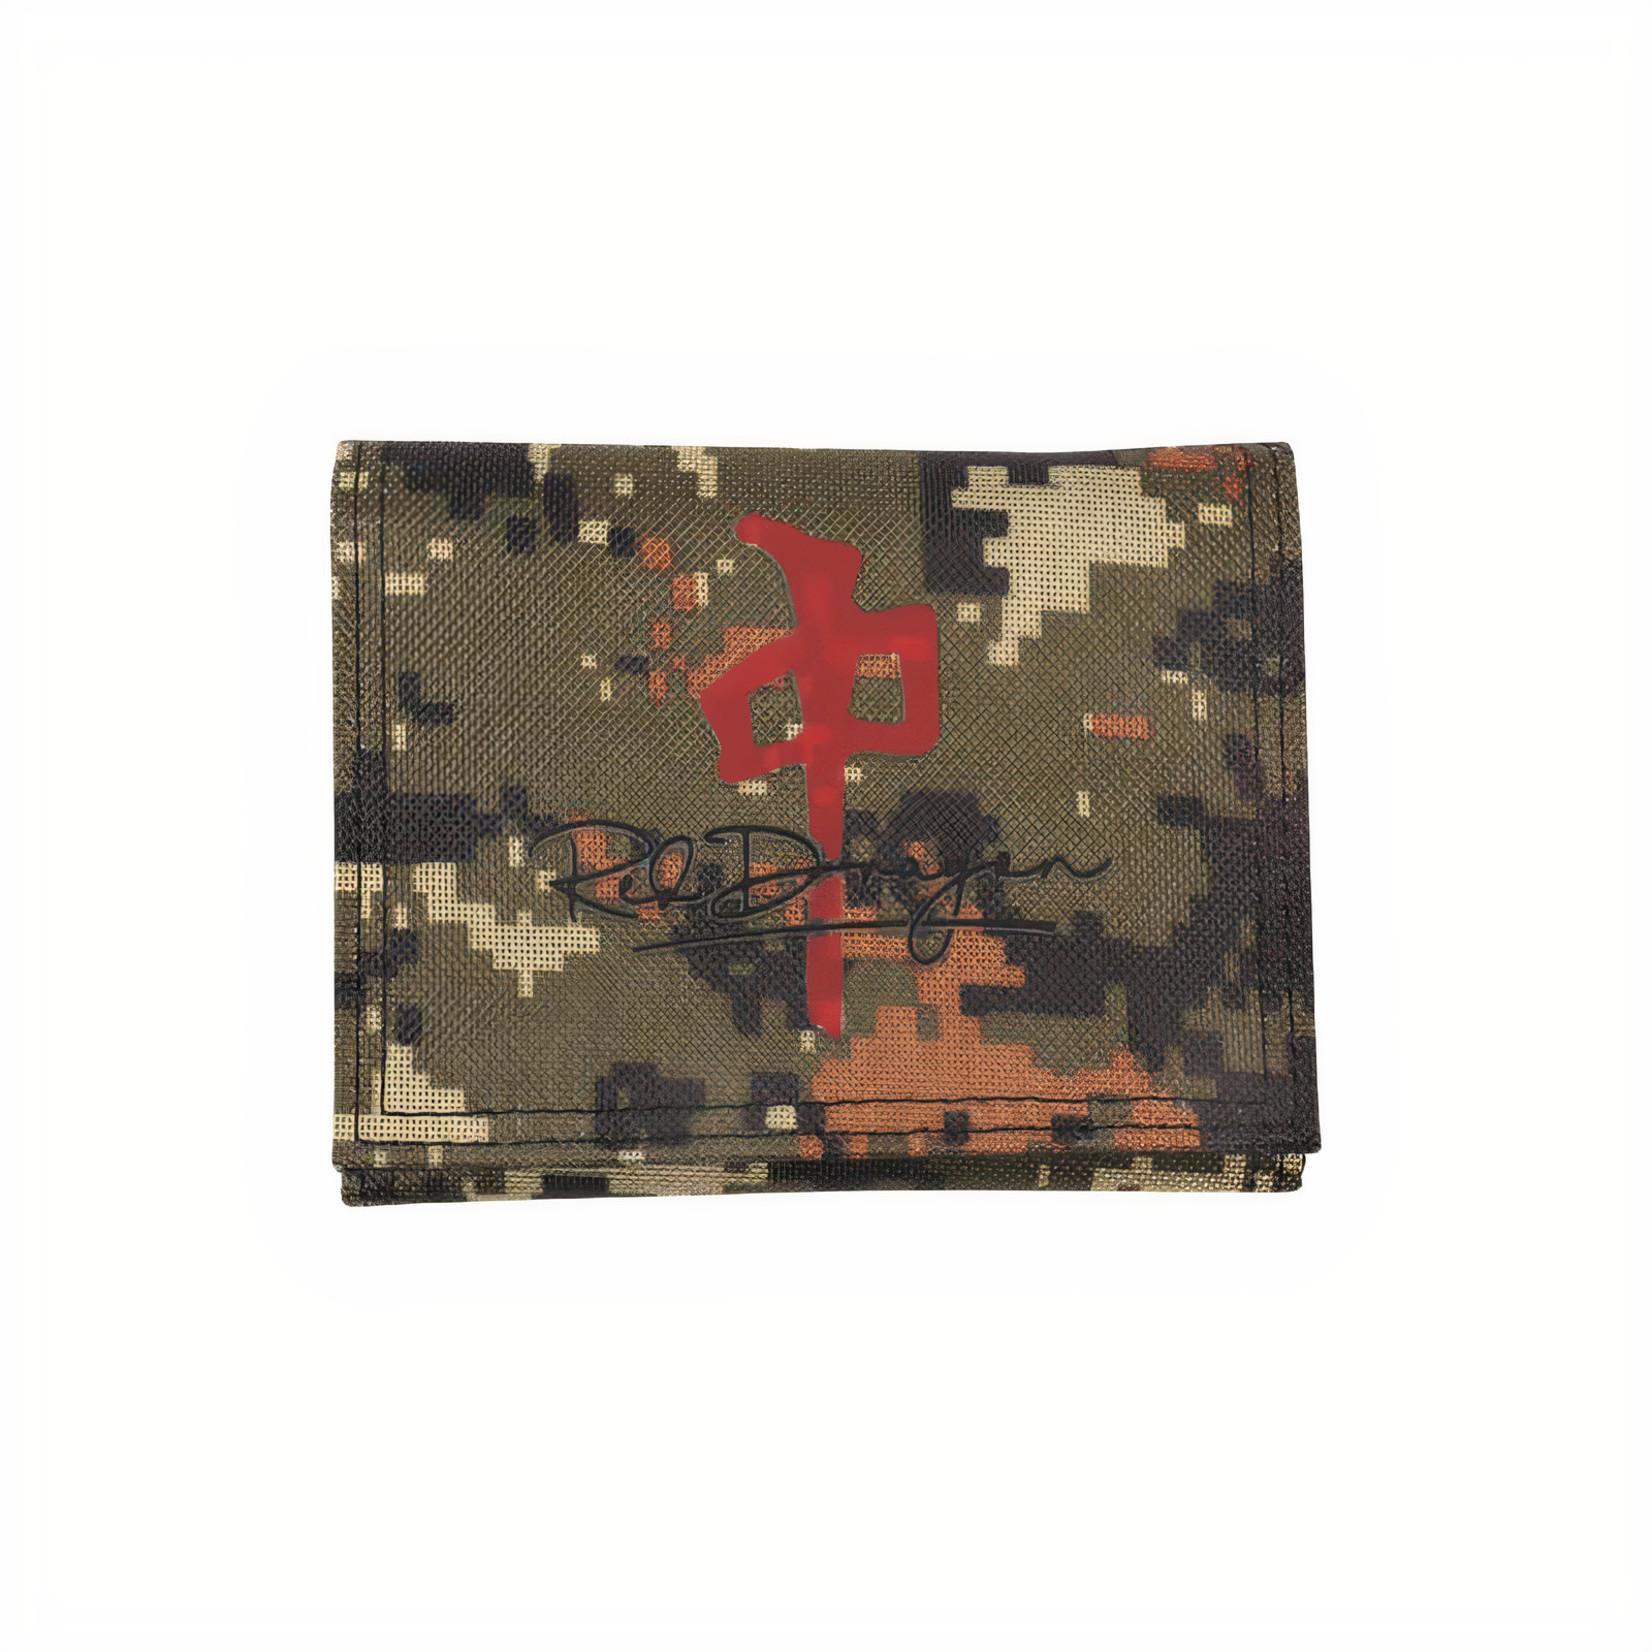 Red Dragon Apparel RDS - Signature Velcro Wallet - Digi Camo